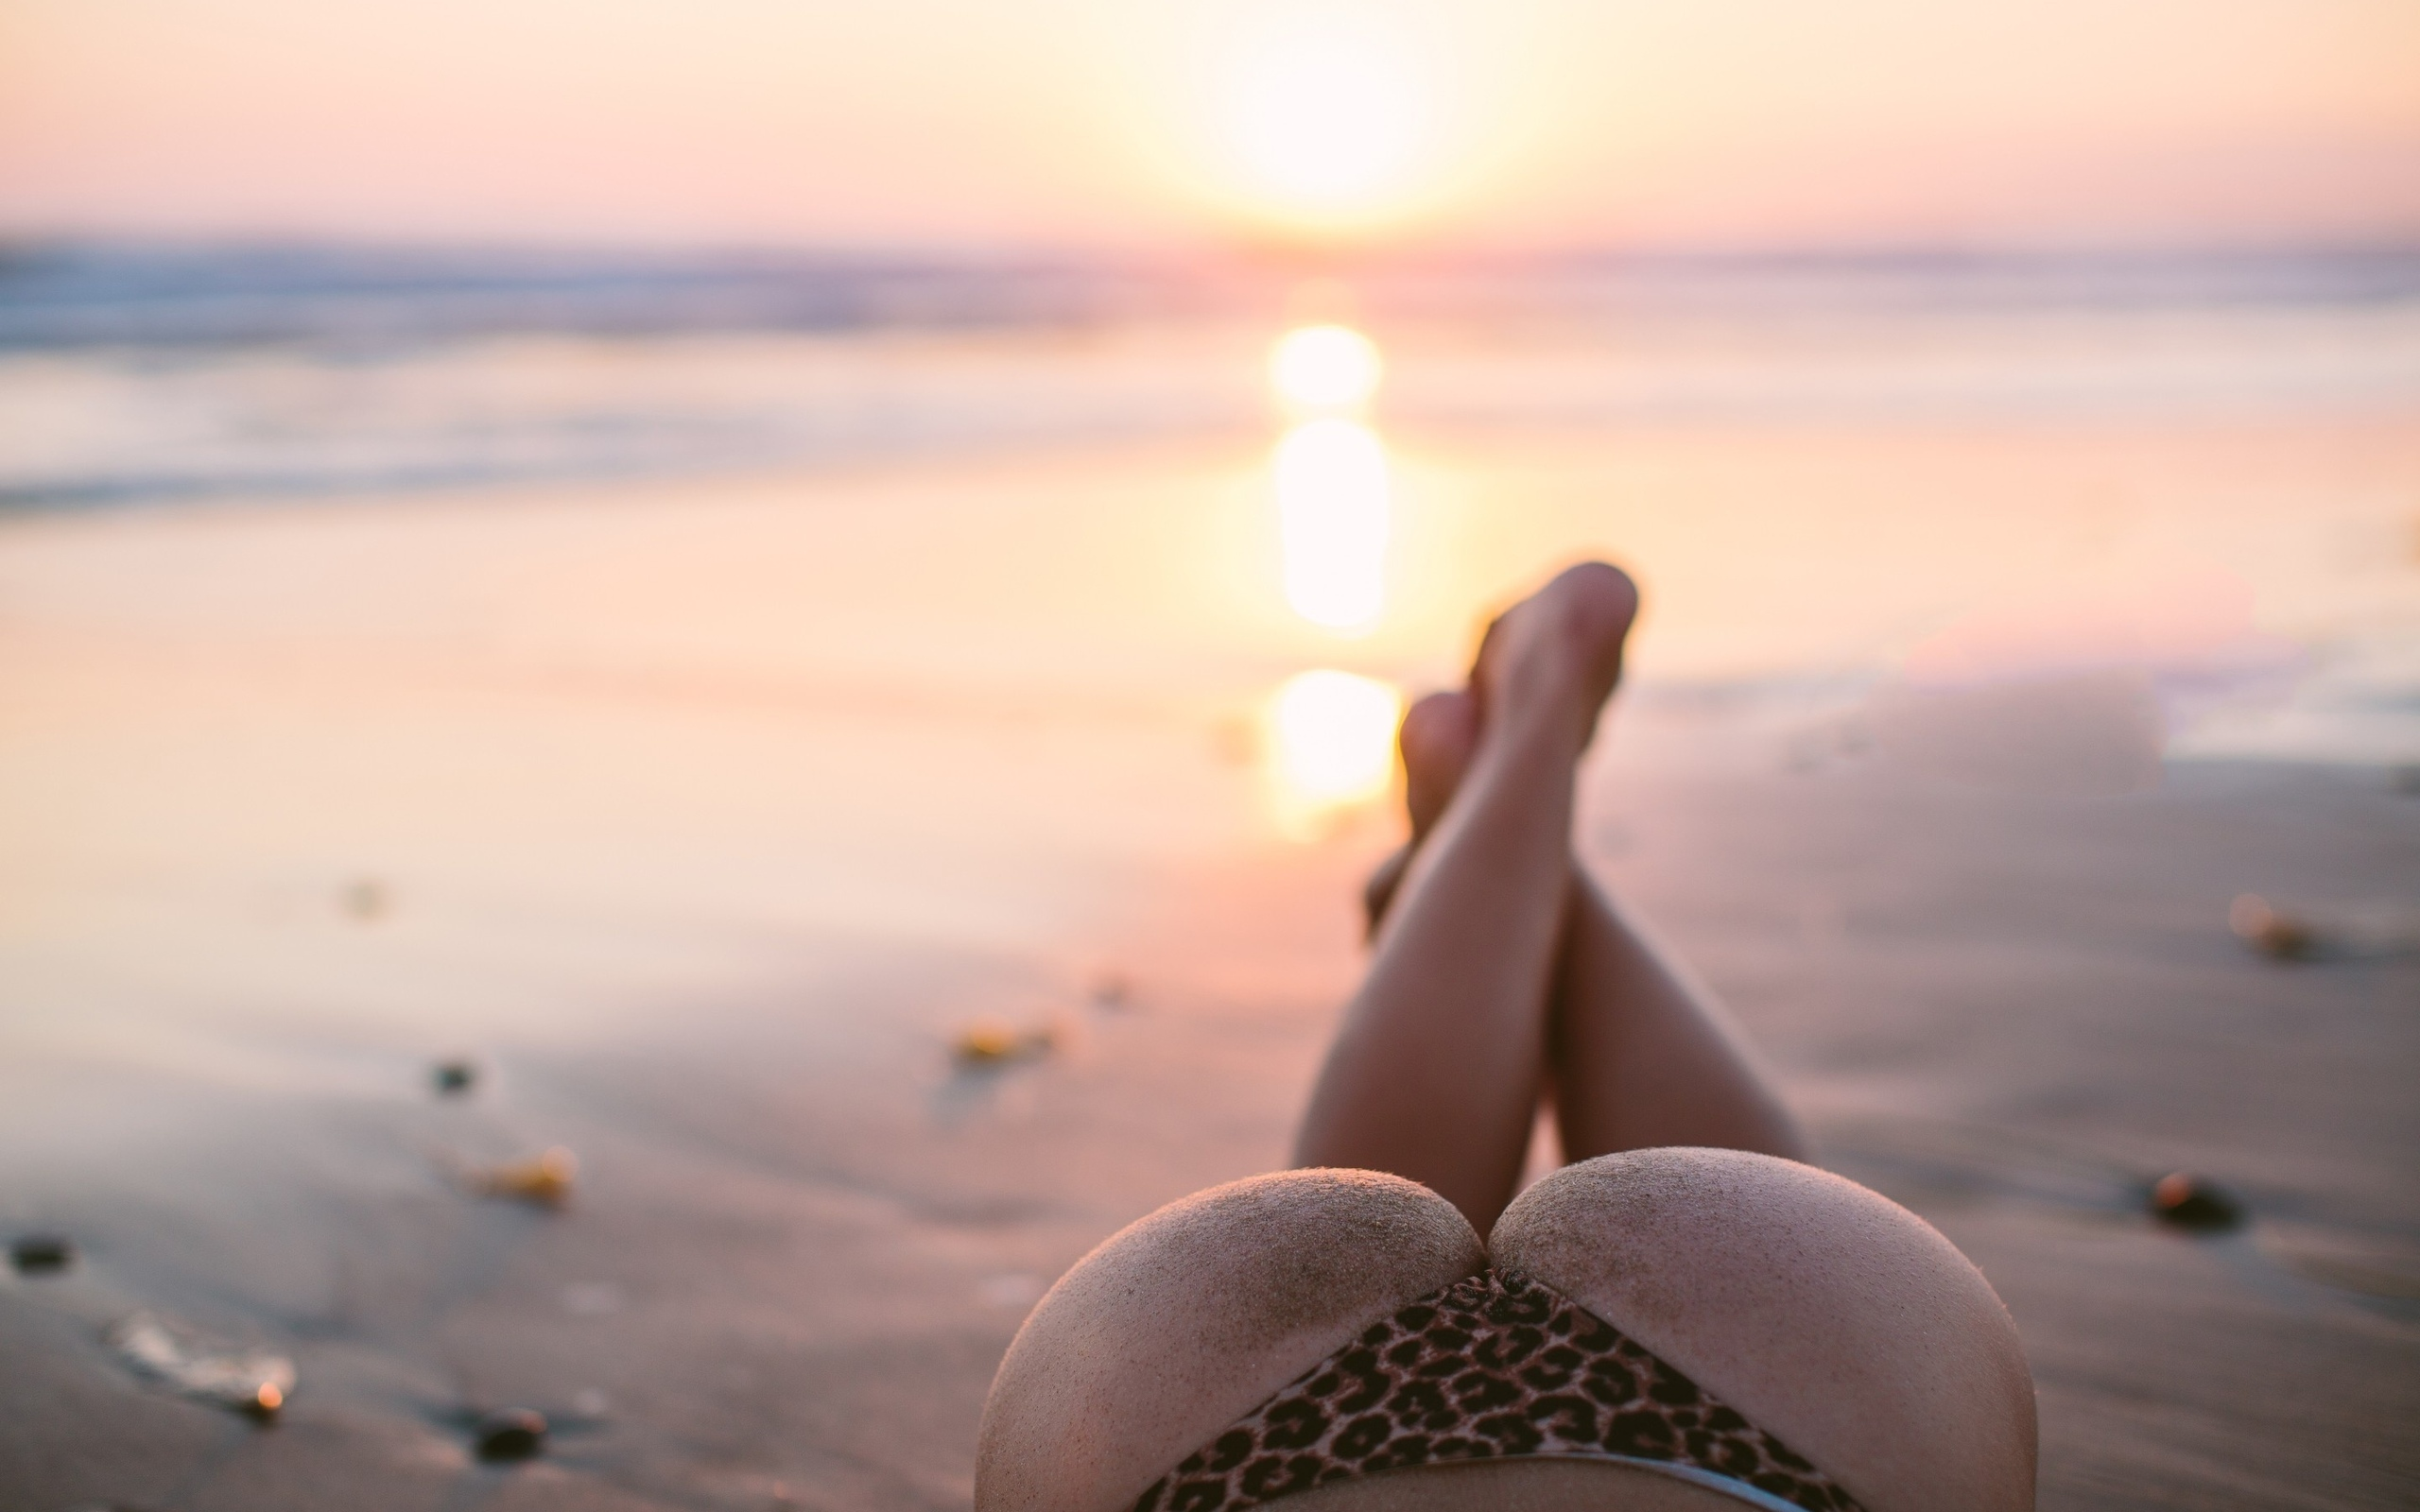 молодые девушки попки ножки лето пляж или поздно